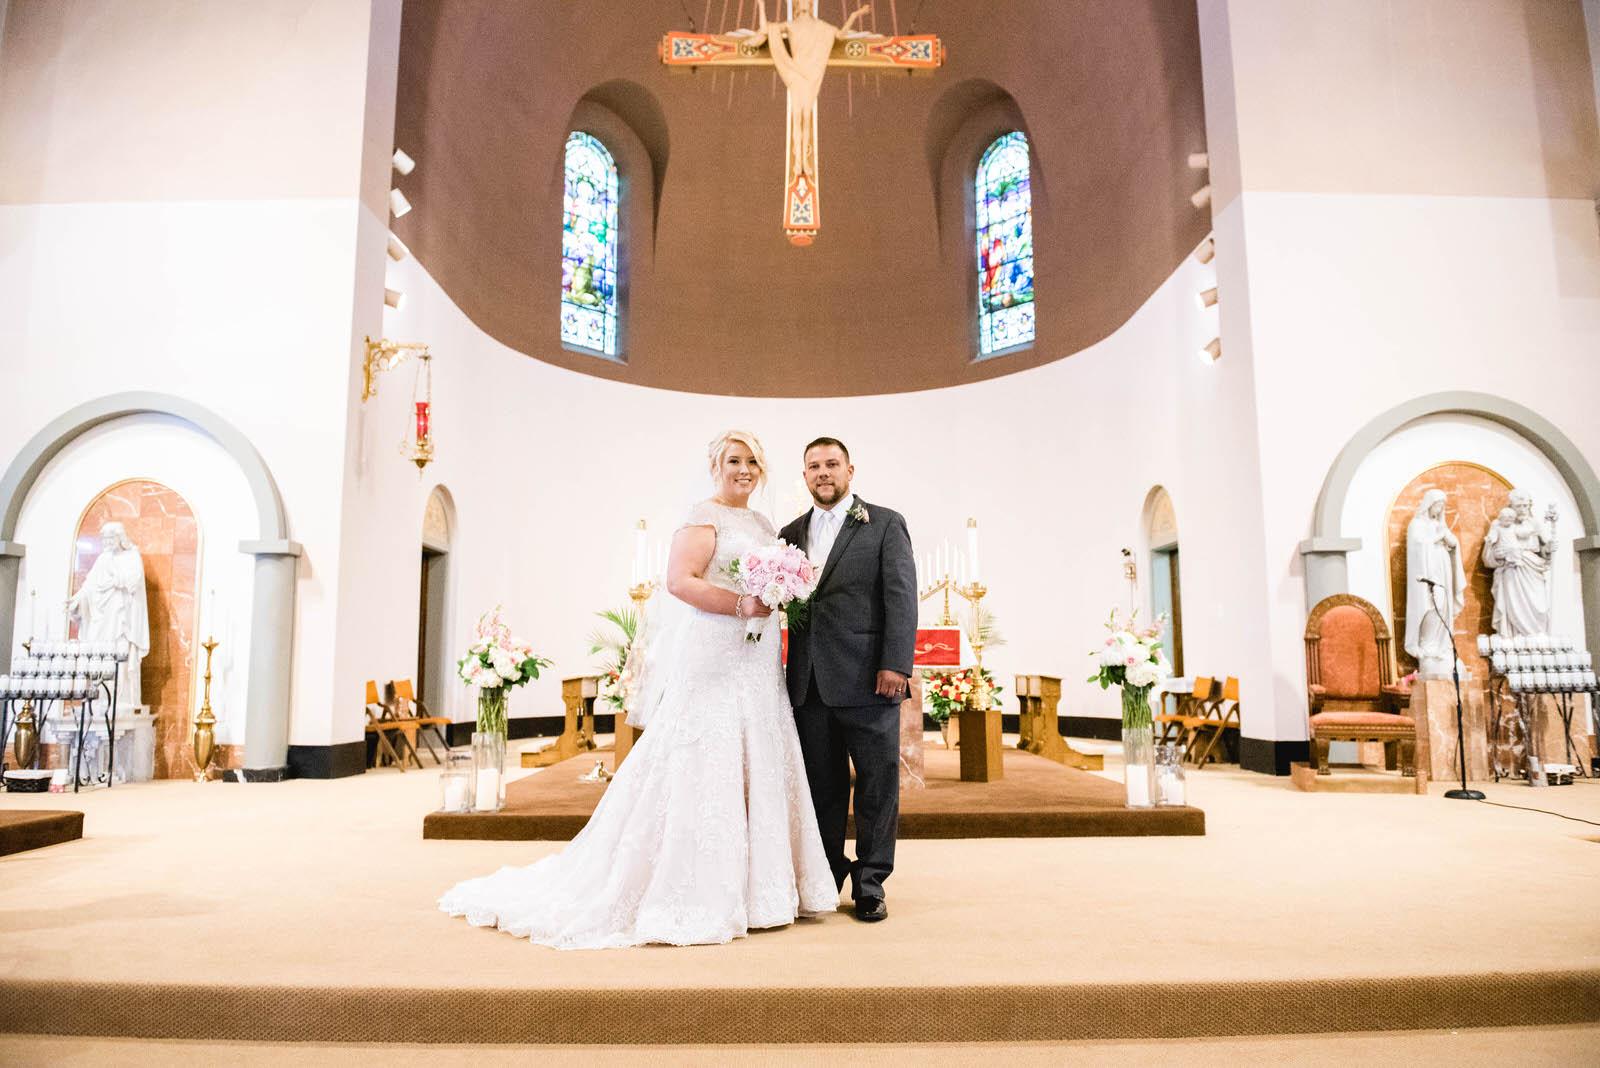 weddings-at-Holy-Cross-Greek-Orthodox-Church-and-Hall-15.jpg